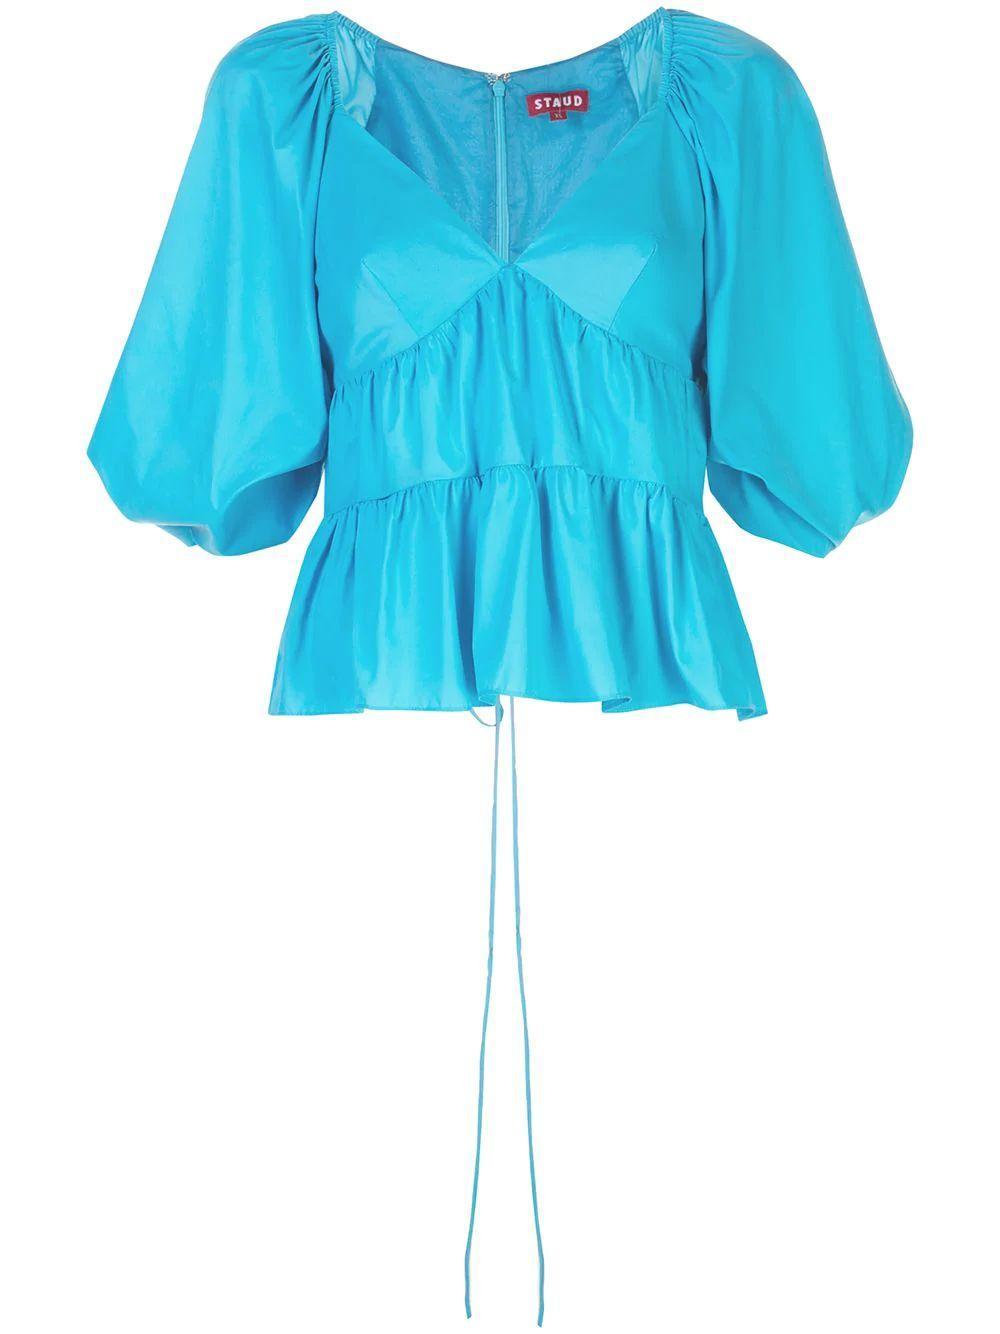 Lucy Puff Sleeve Peplum Top Item # 214-3187-BRBL